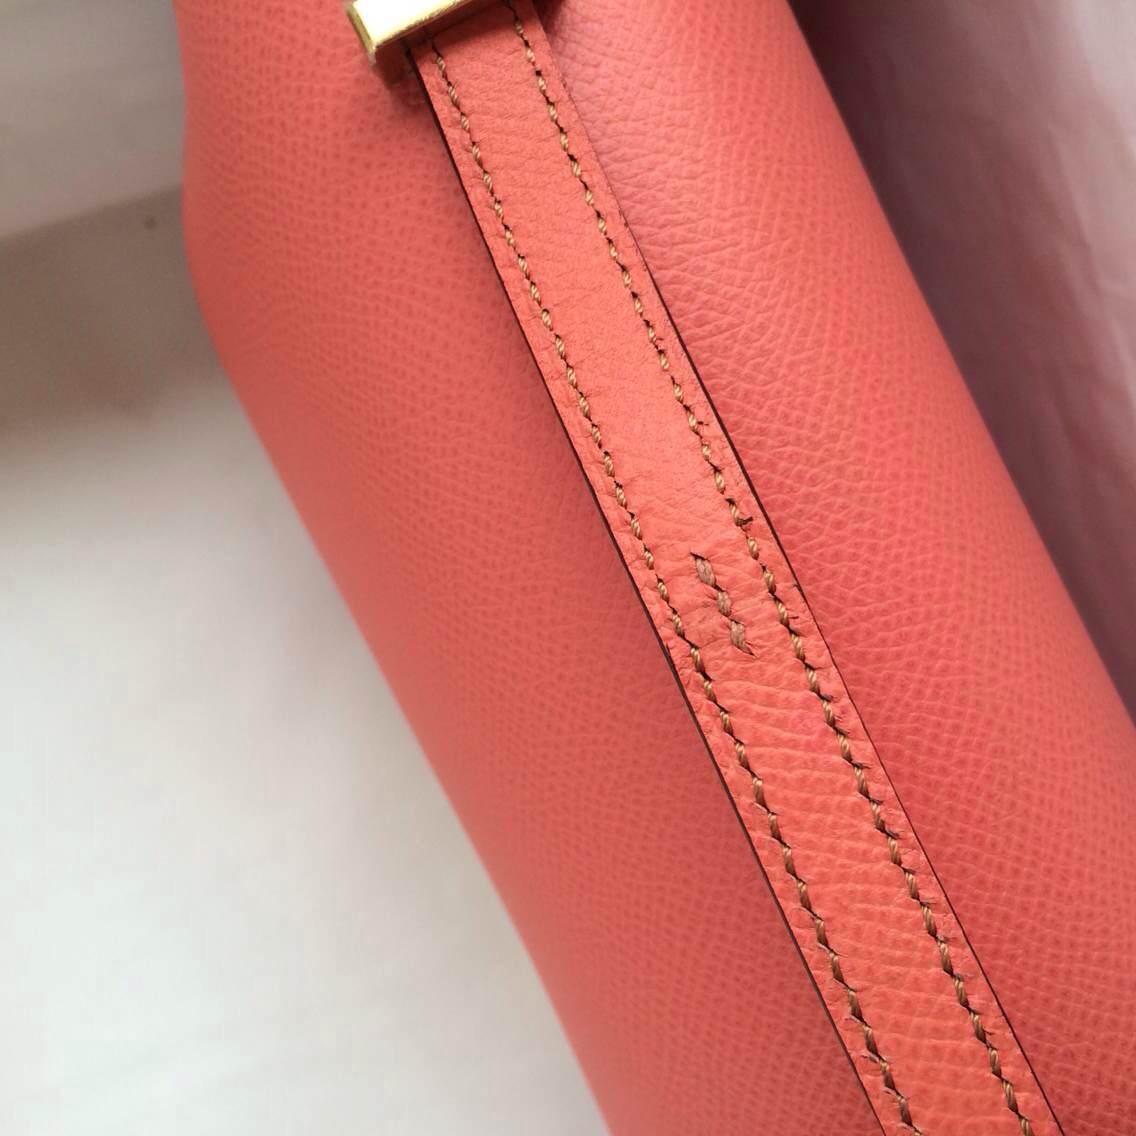 Pretty i5 Flamingo France Epsom Leather Constance elan Bag Womens' Shoulder Bag